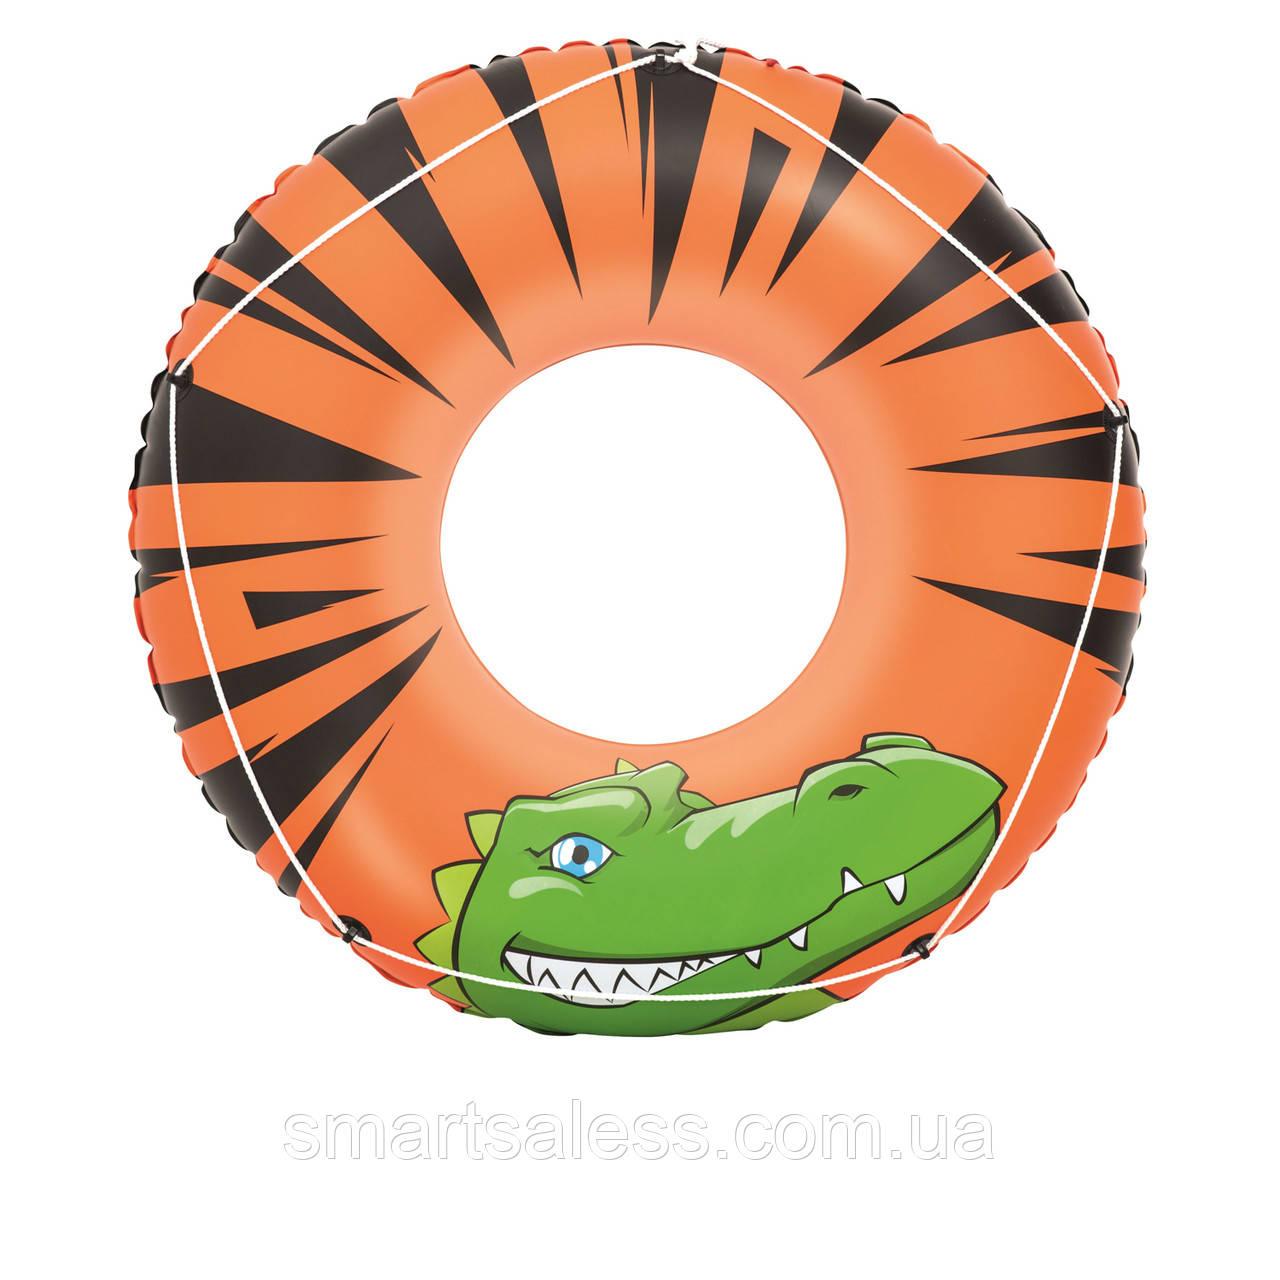 Bestway надувний круг 36108 «River Gator» з канатом, 119 см